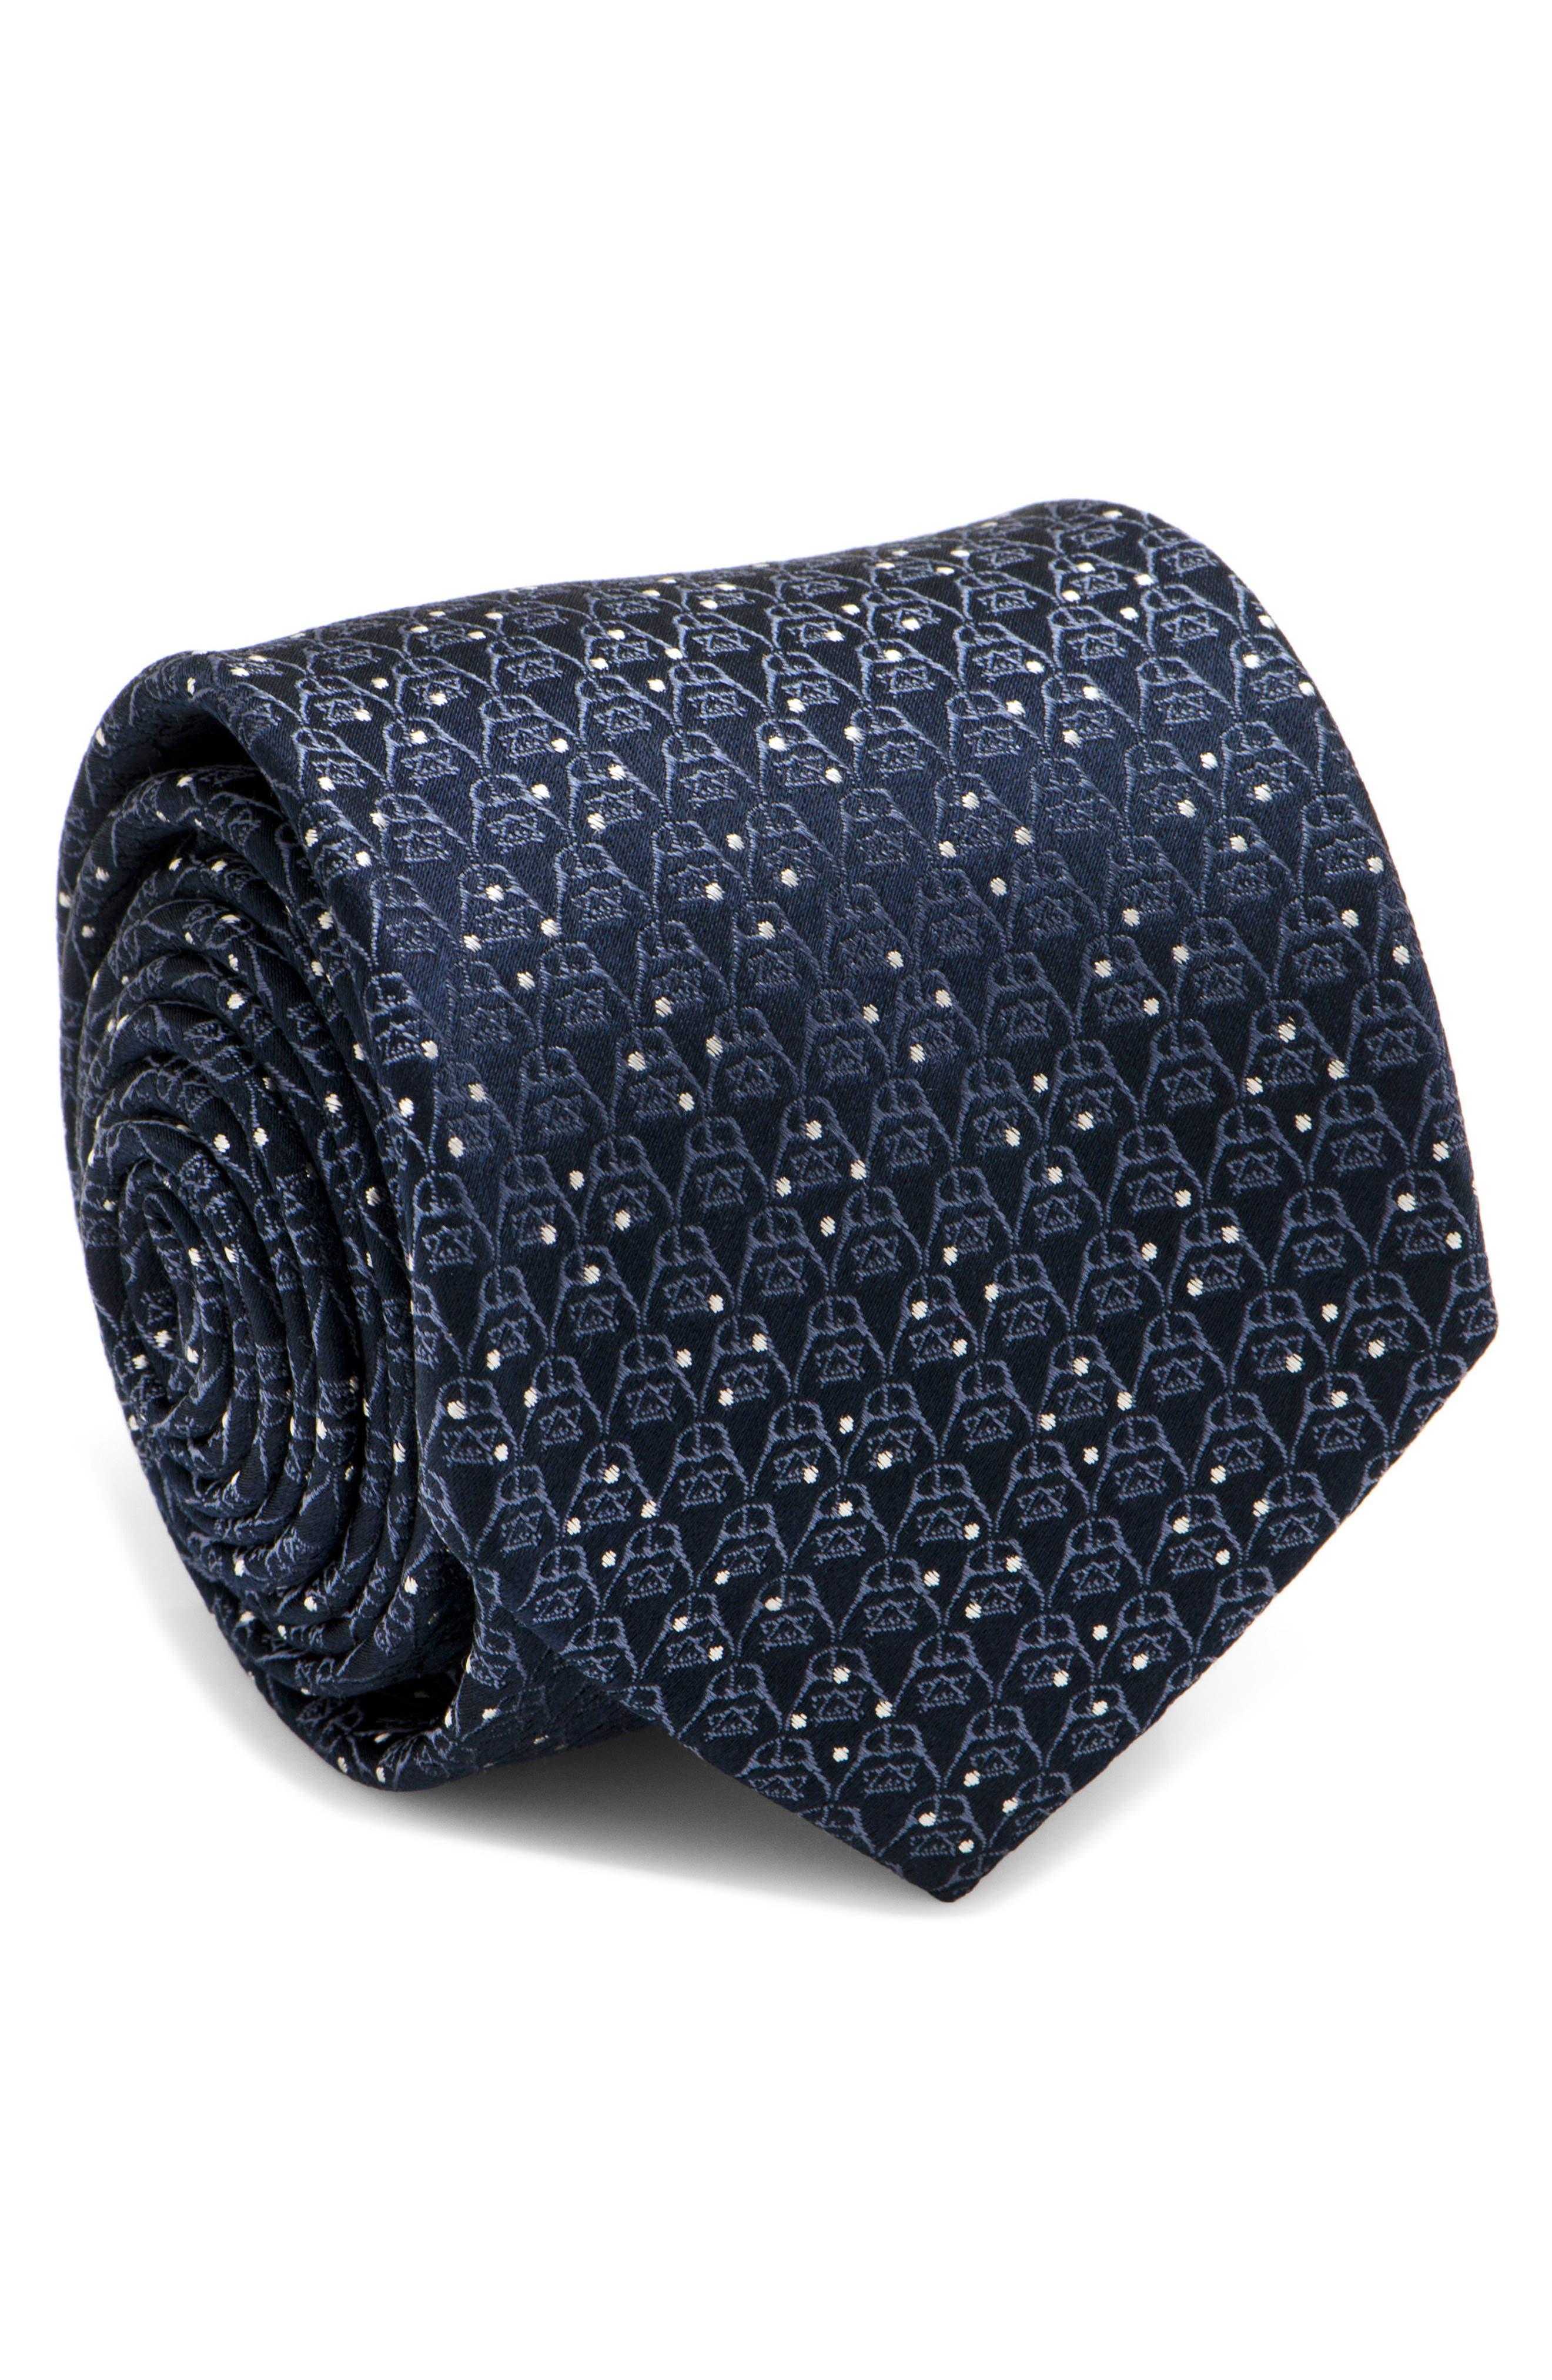 Alternate Image 1 Selected - Cufflinks Inc. Darth Vader Dot Tie